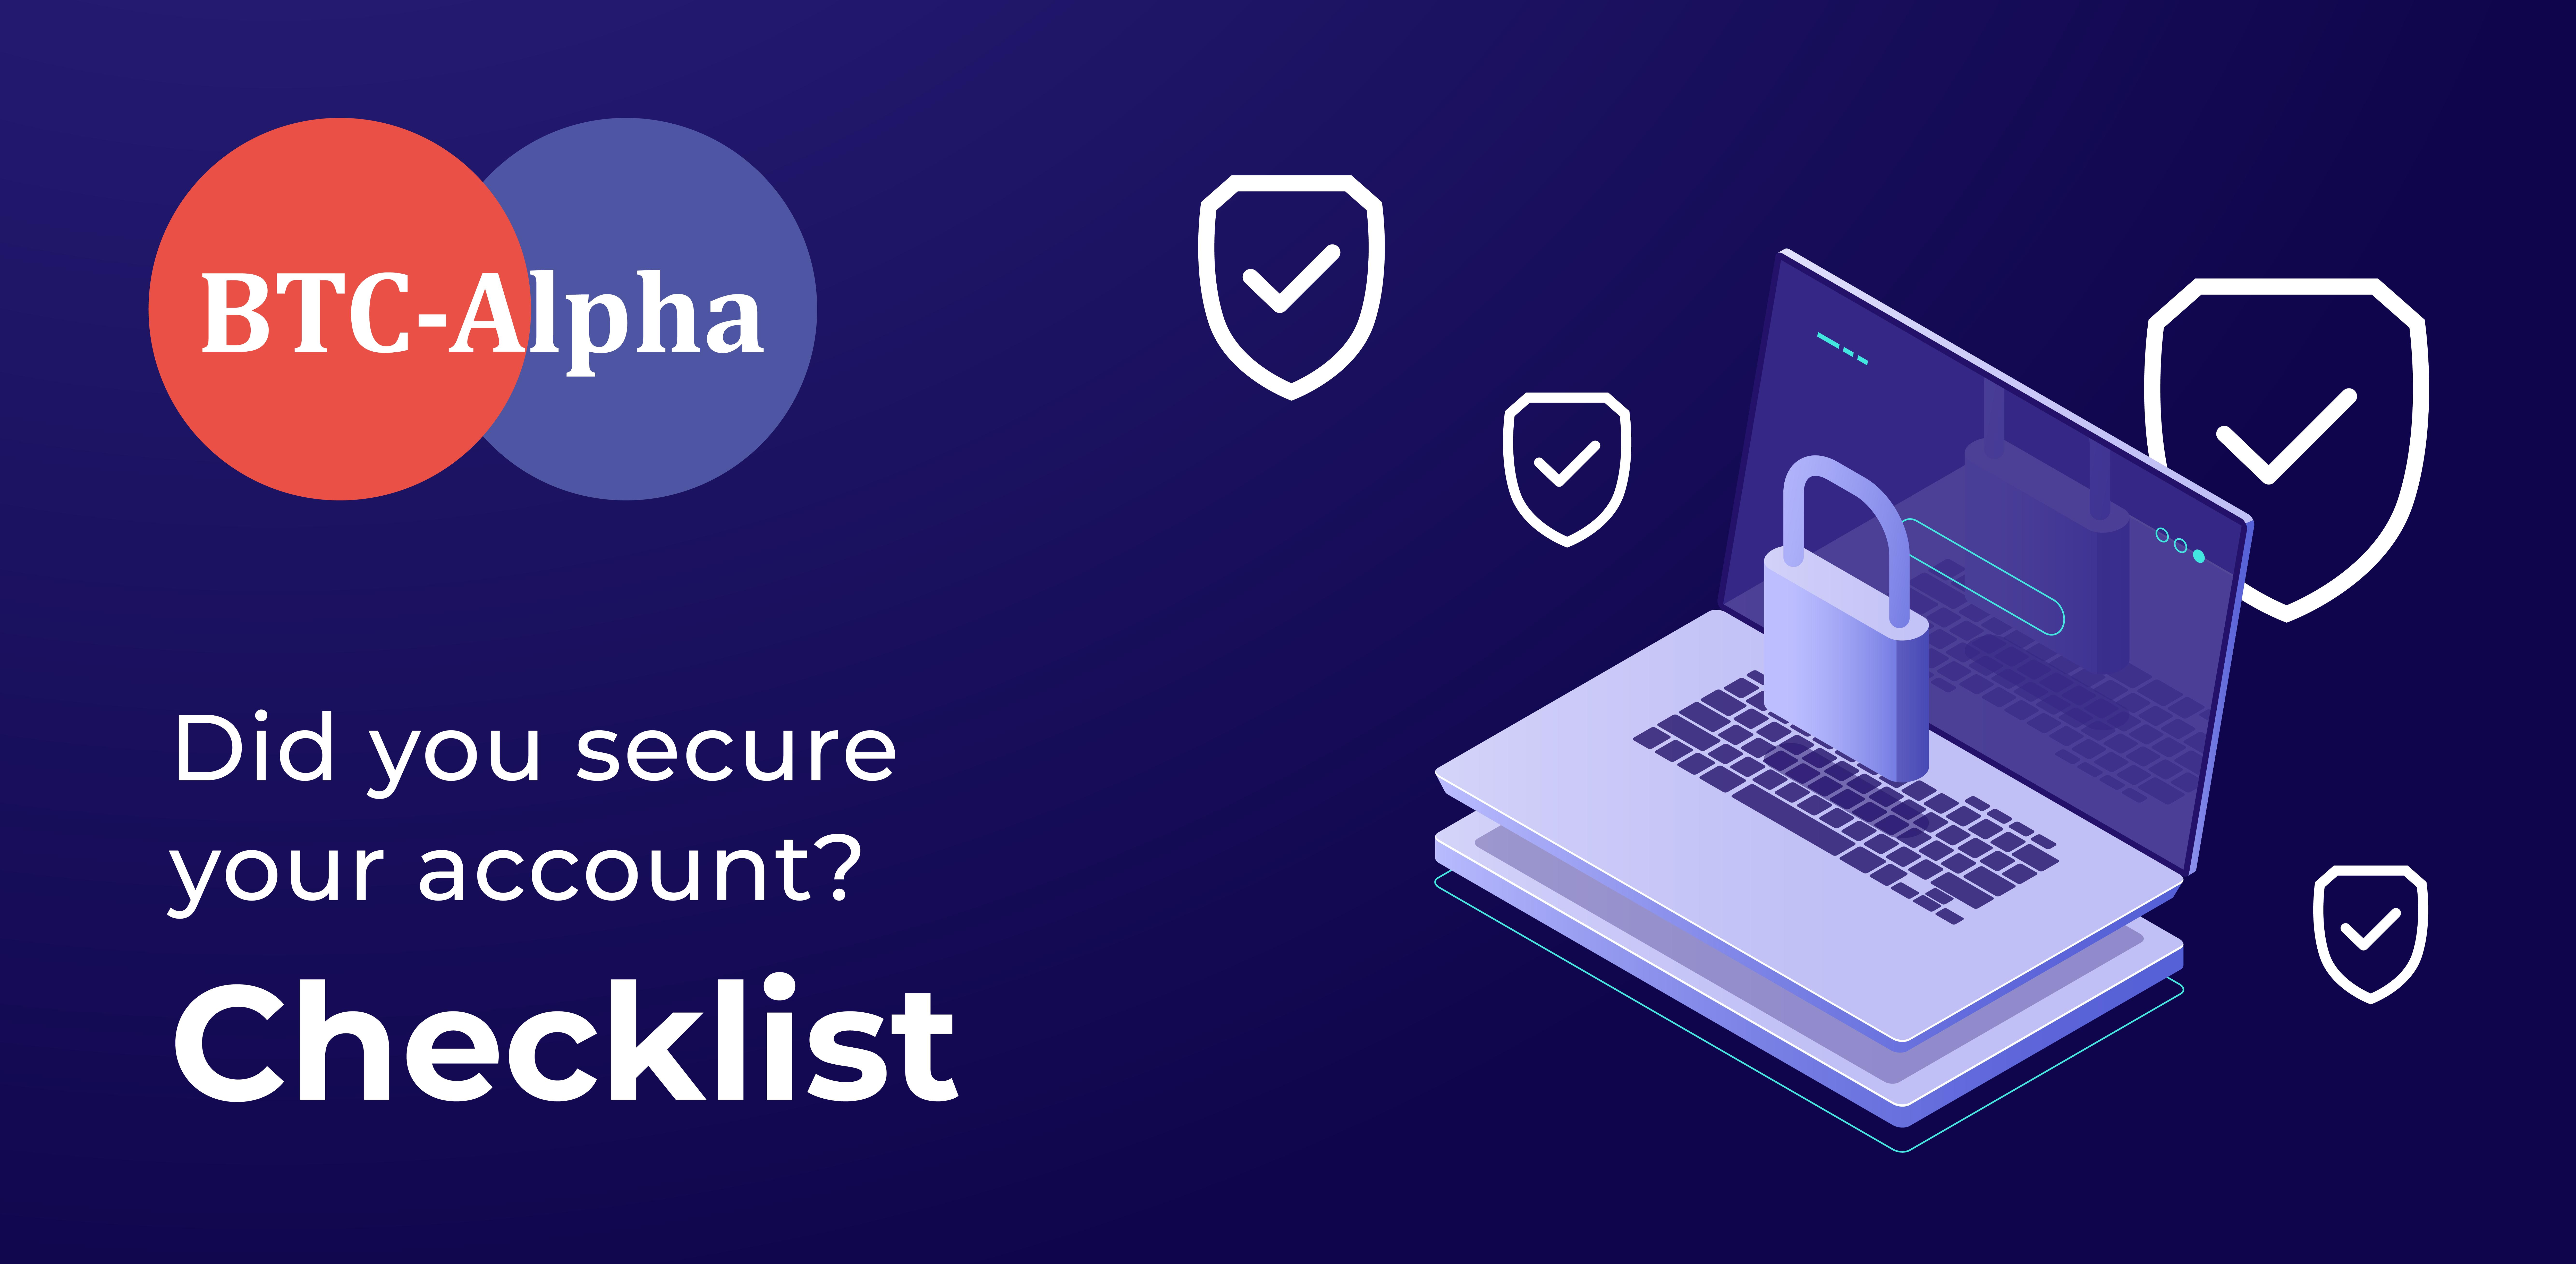 Assets Security Checklist By BTC-Alpha